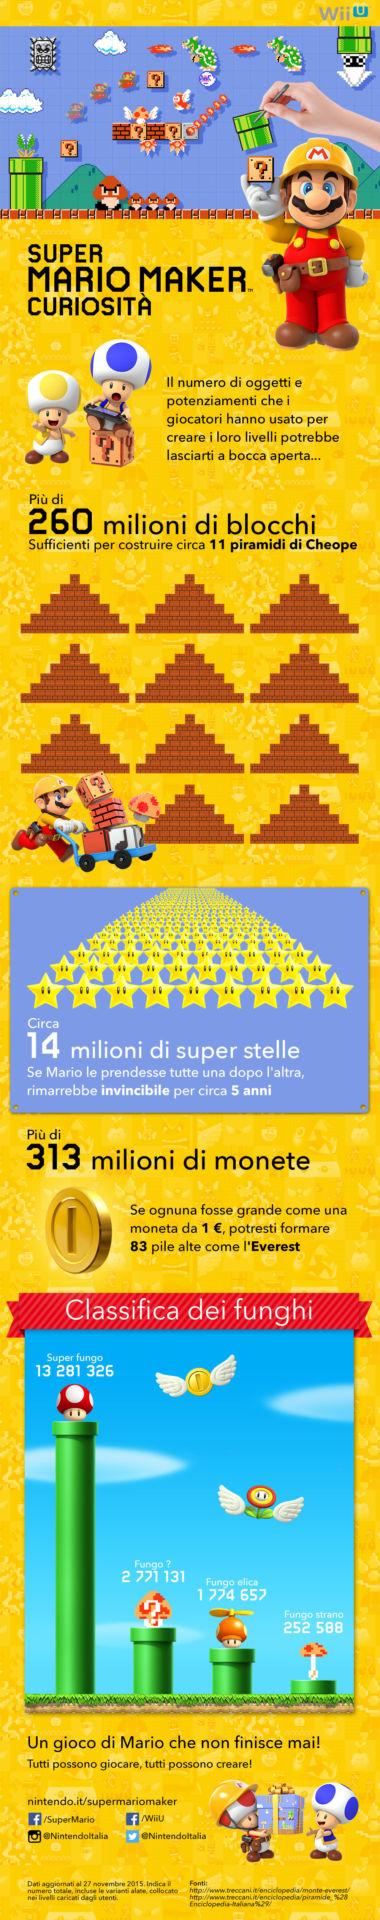 super-mario-maker-infografica_1